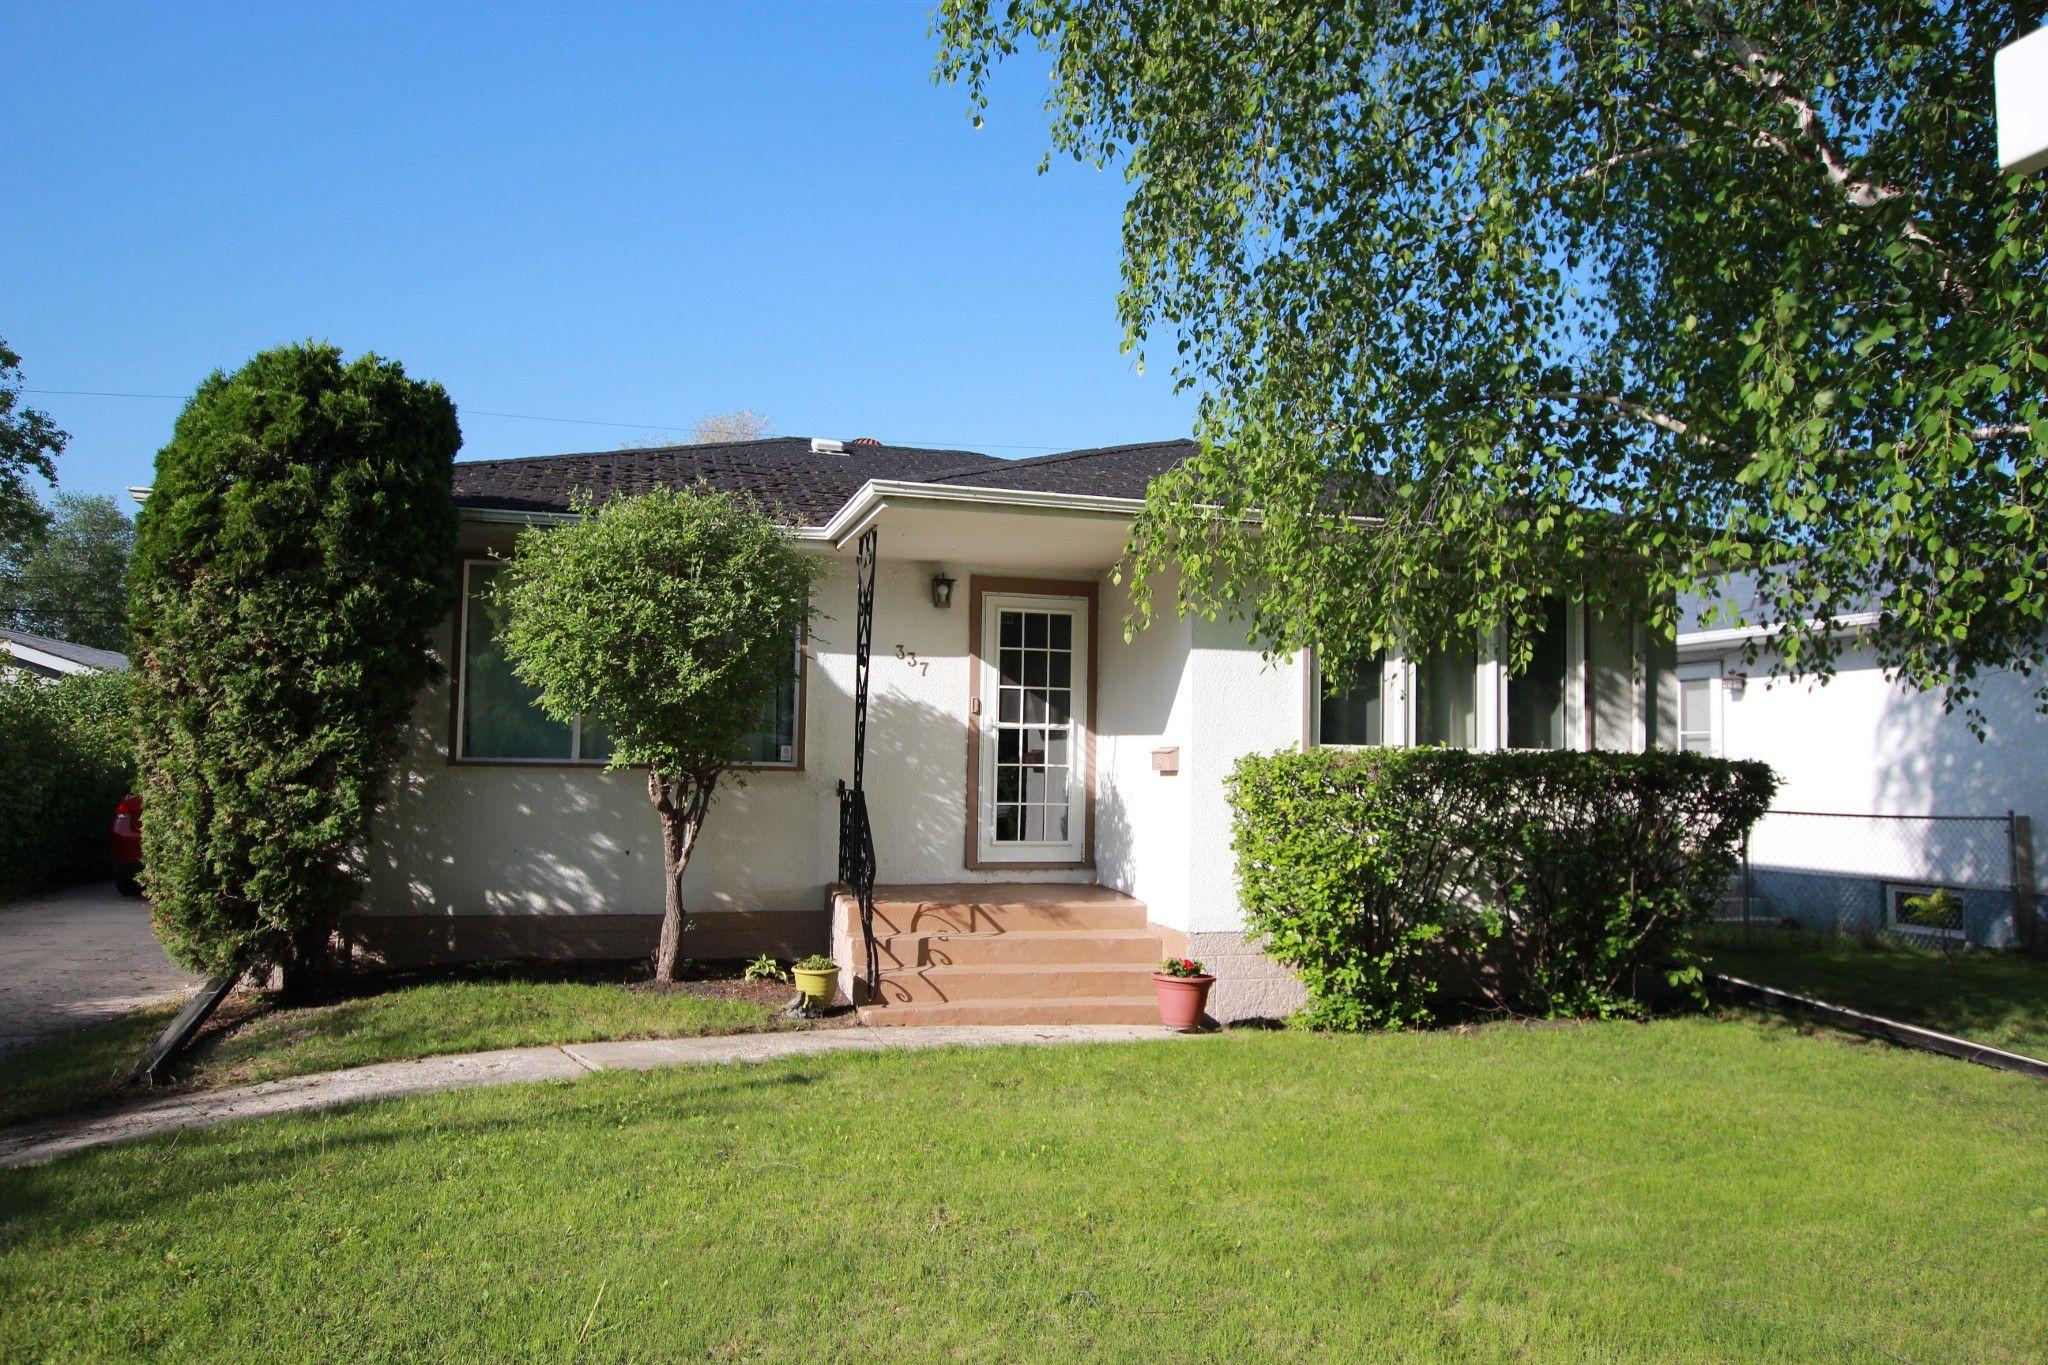 Main Photo: 337 Devon Avenue in Winnipeg: North Kildonan House for sale (3F)  : MLS®# 1614702